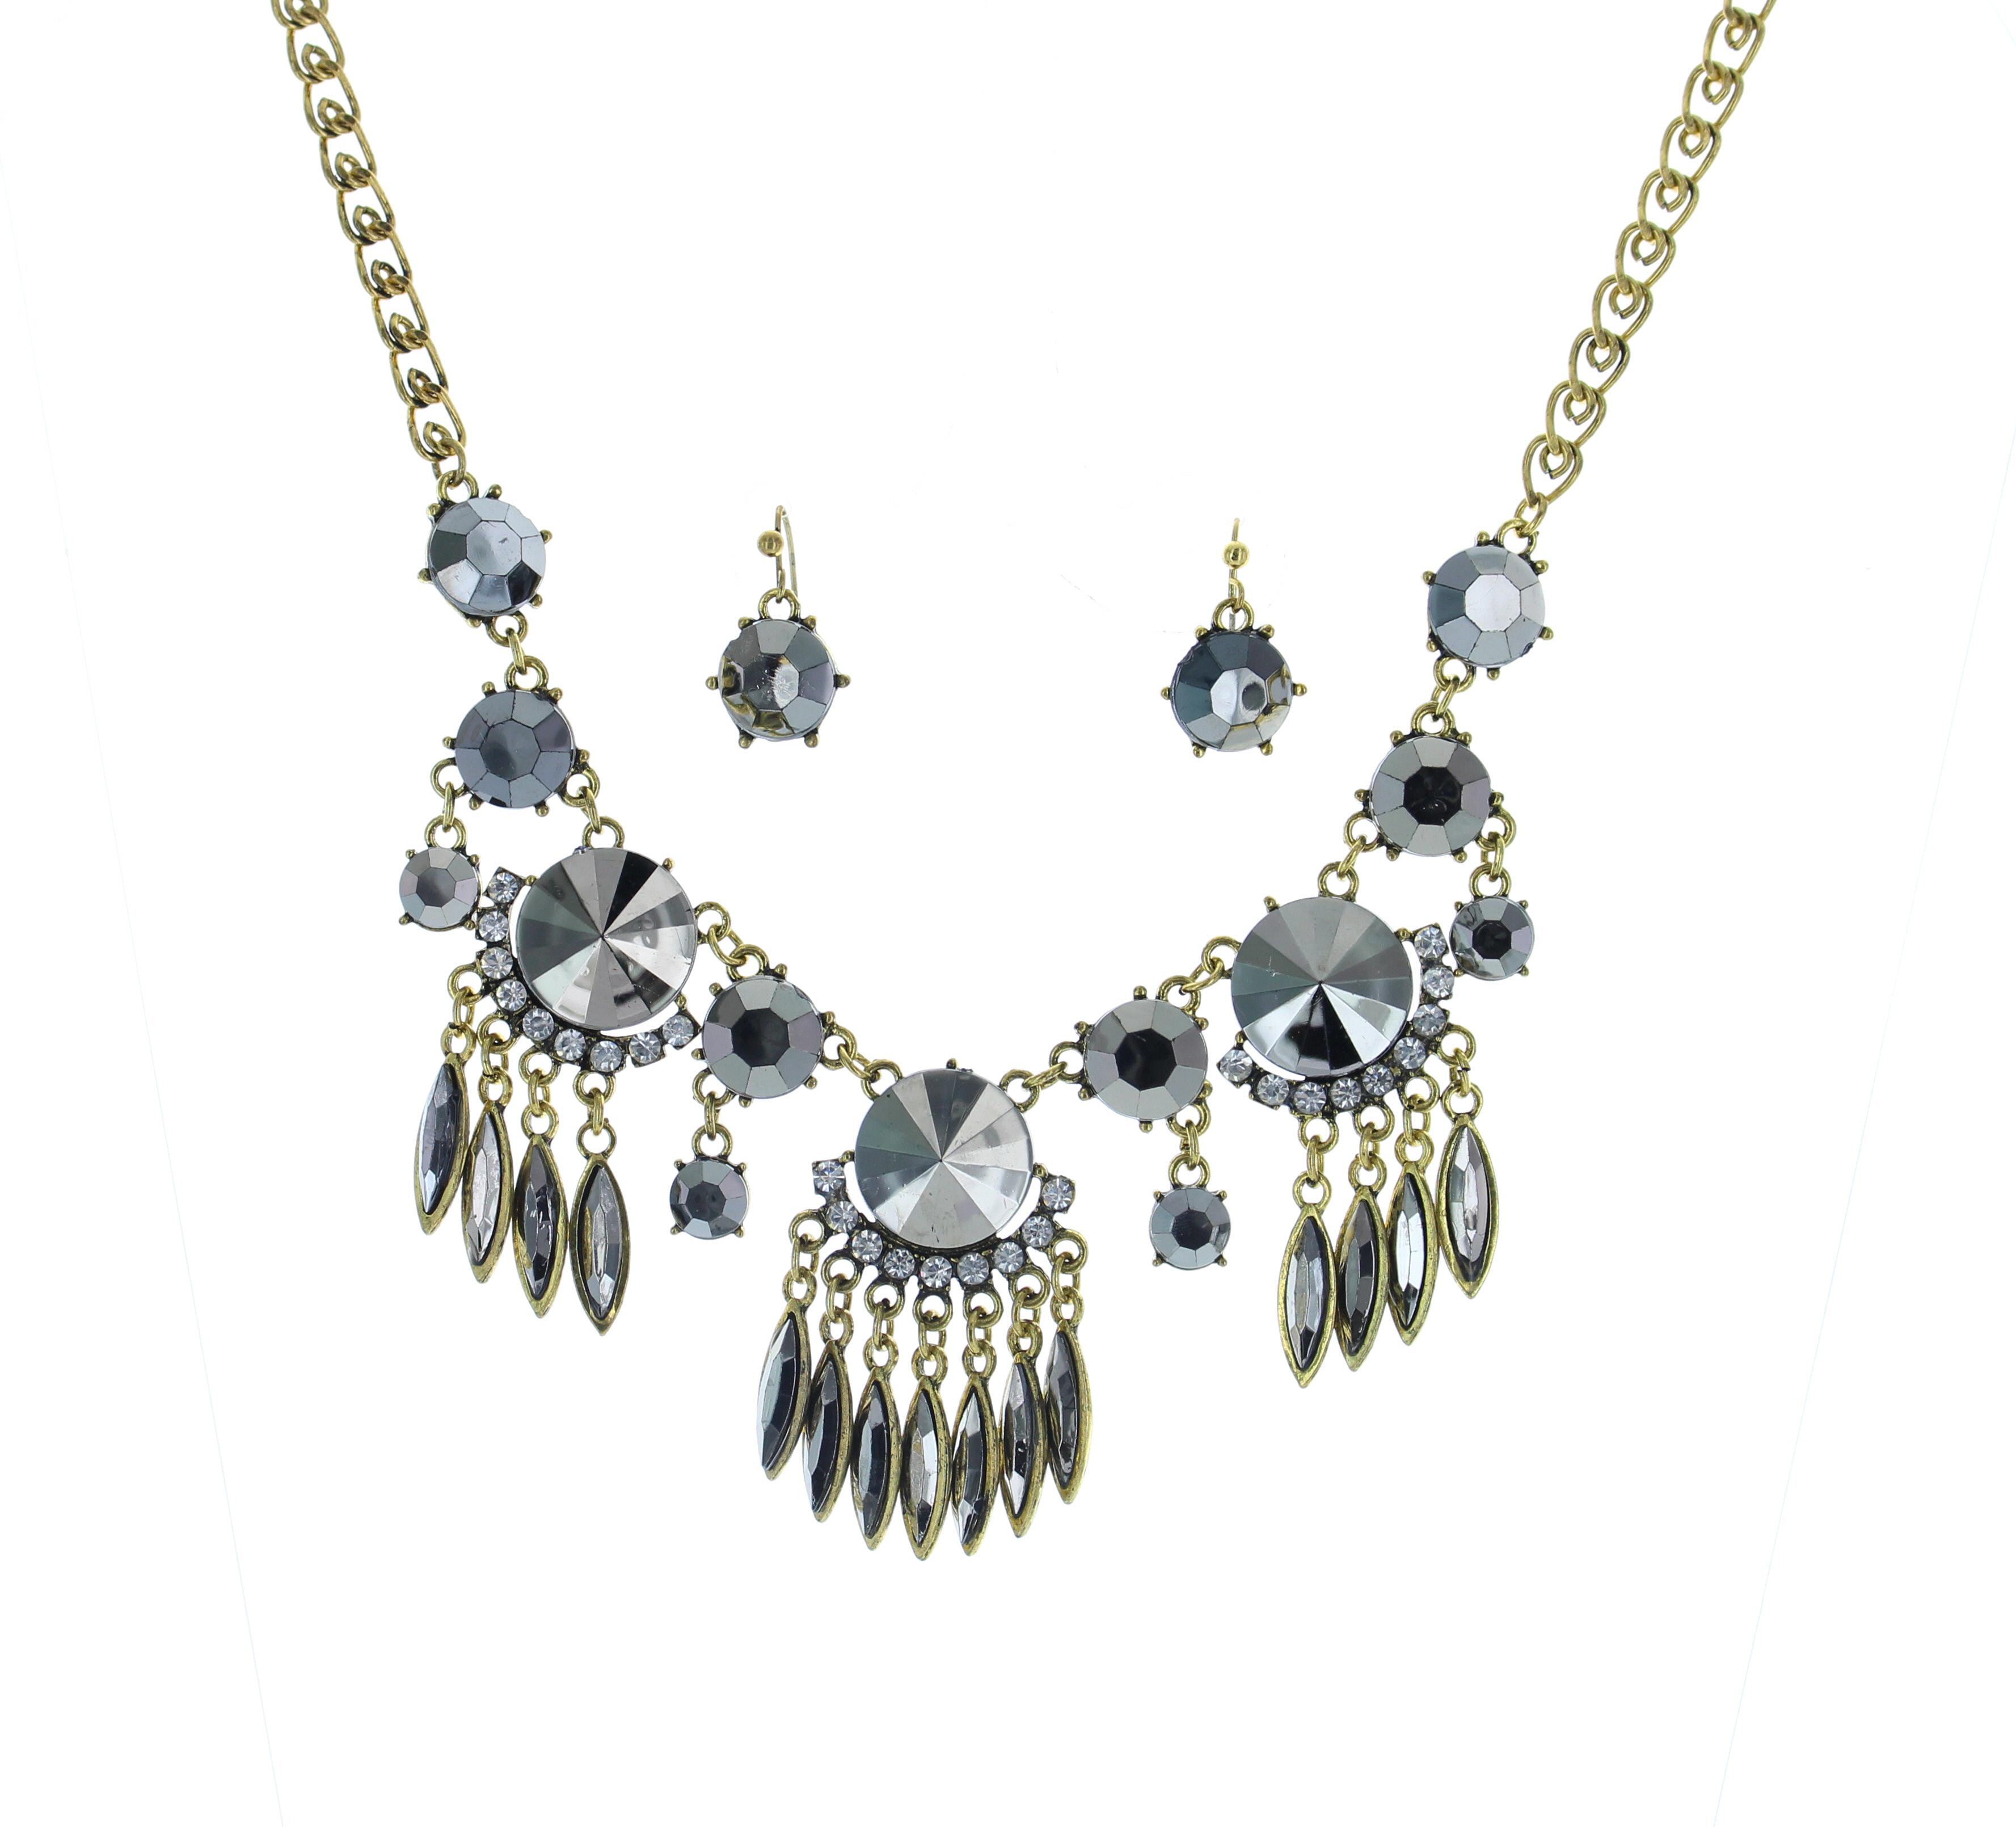 Metallic chandelier best of everything online shopping - Chandelier online shopping ...